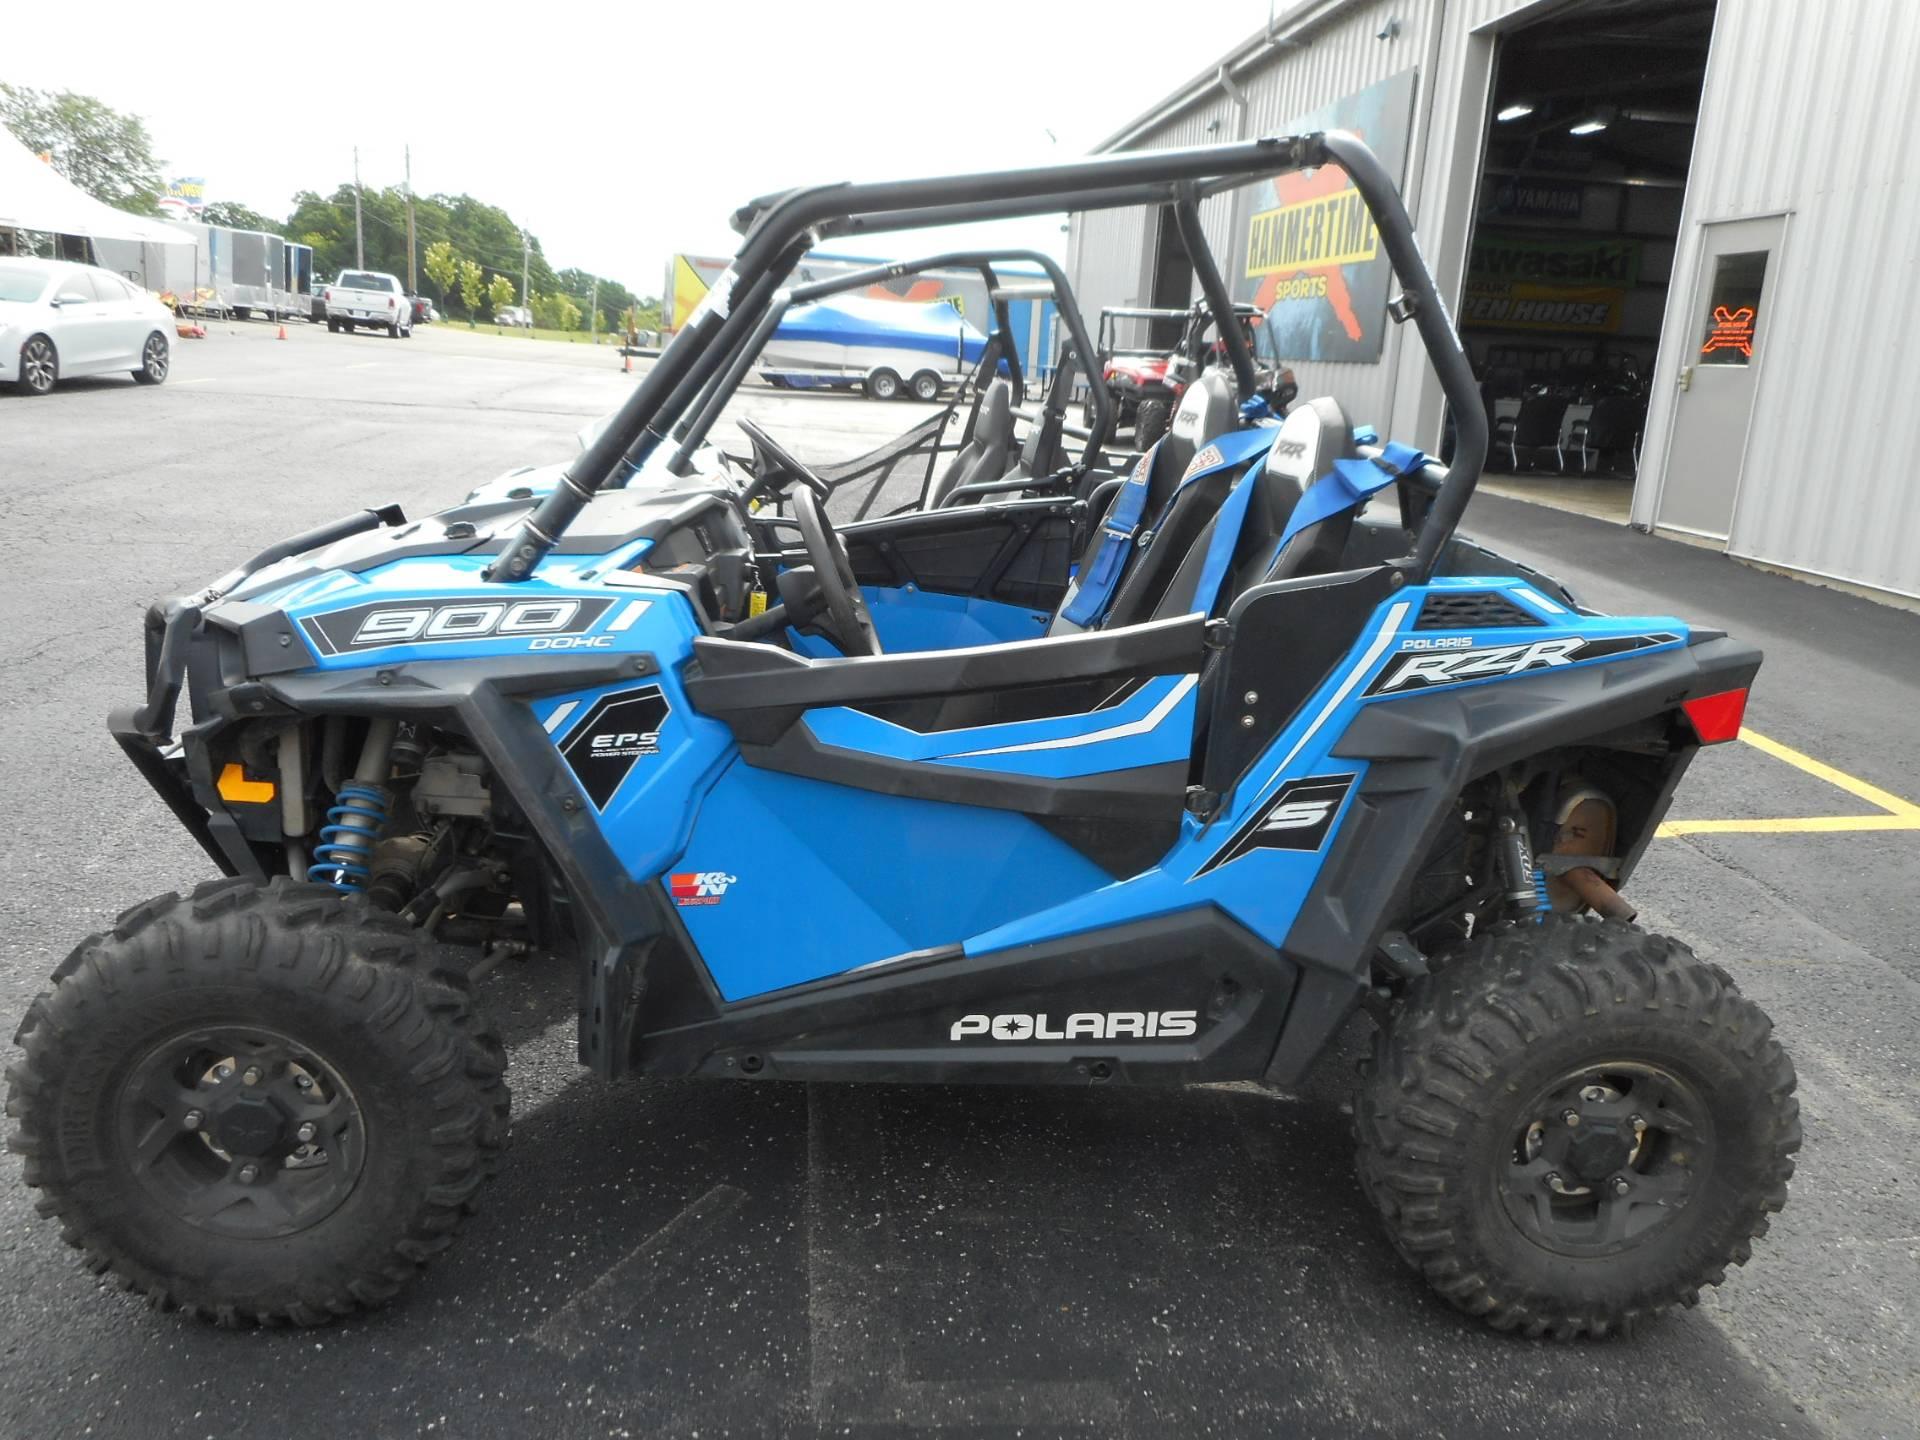 2015 Polaris Rzr >> 2015 Polaris Rzr S 900 Eps In Belvidere Illinois